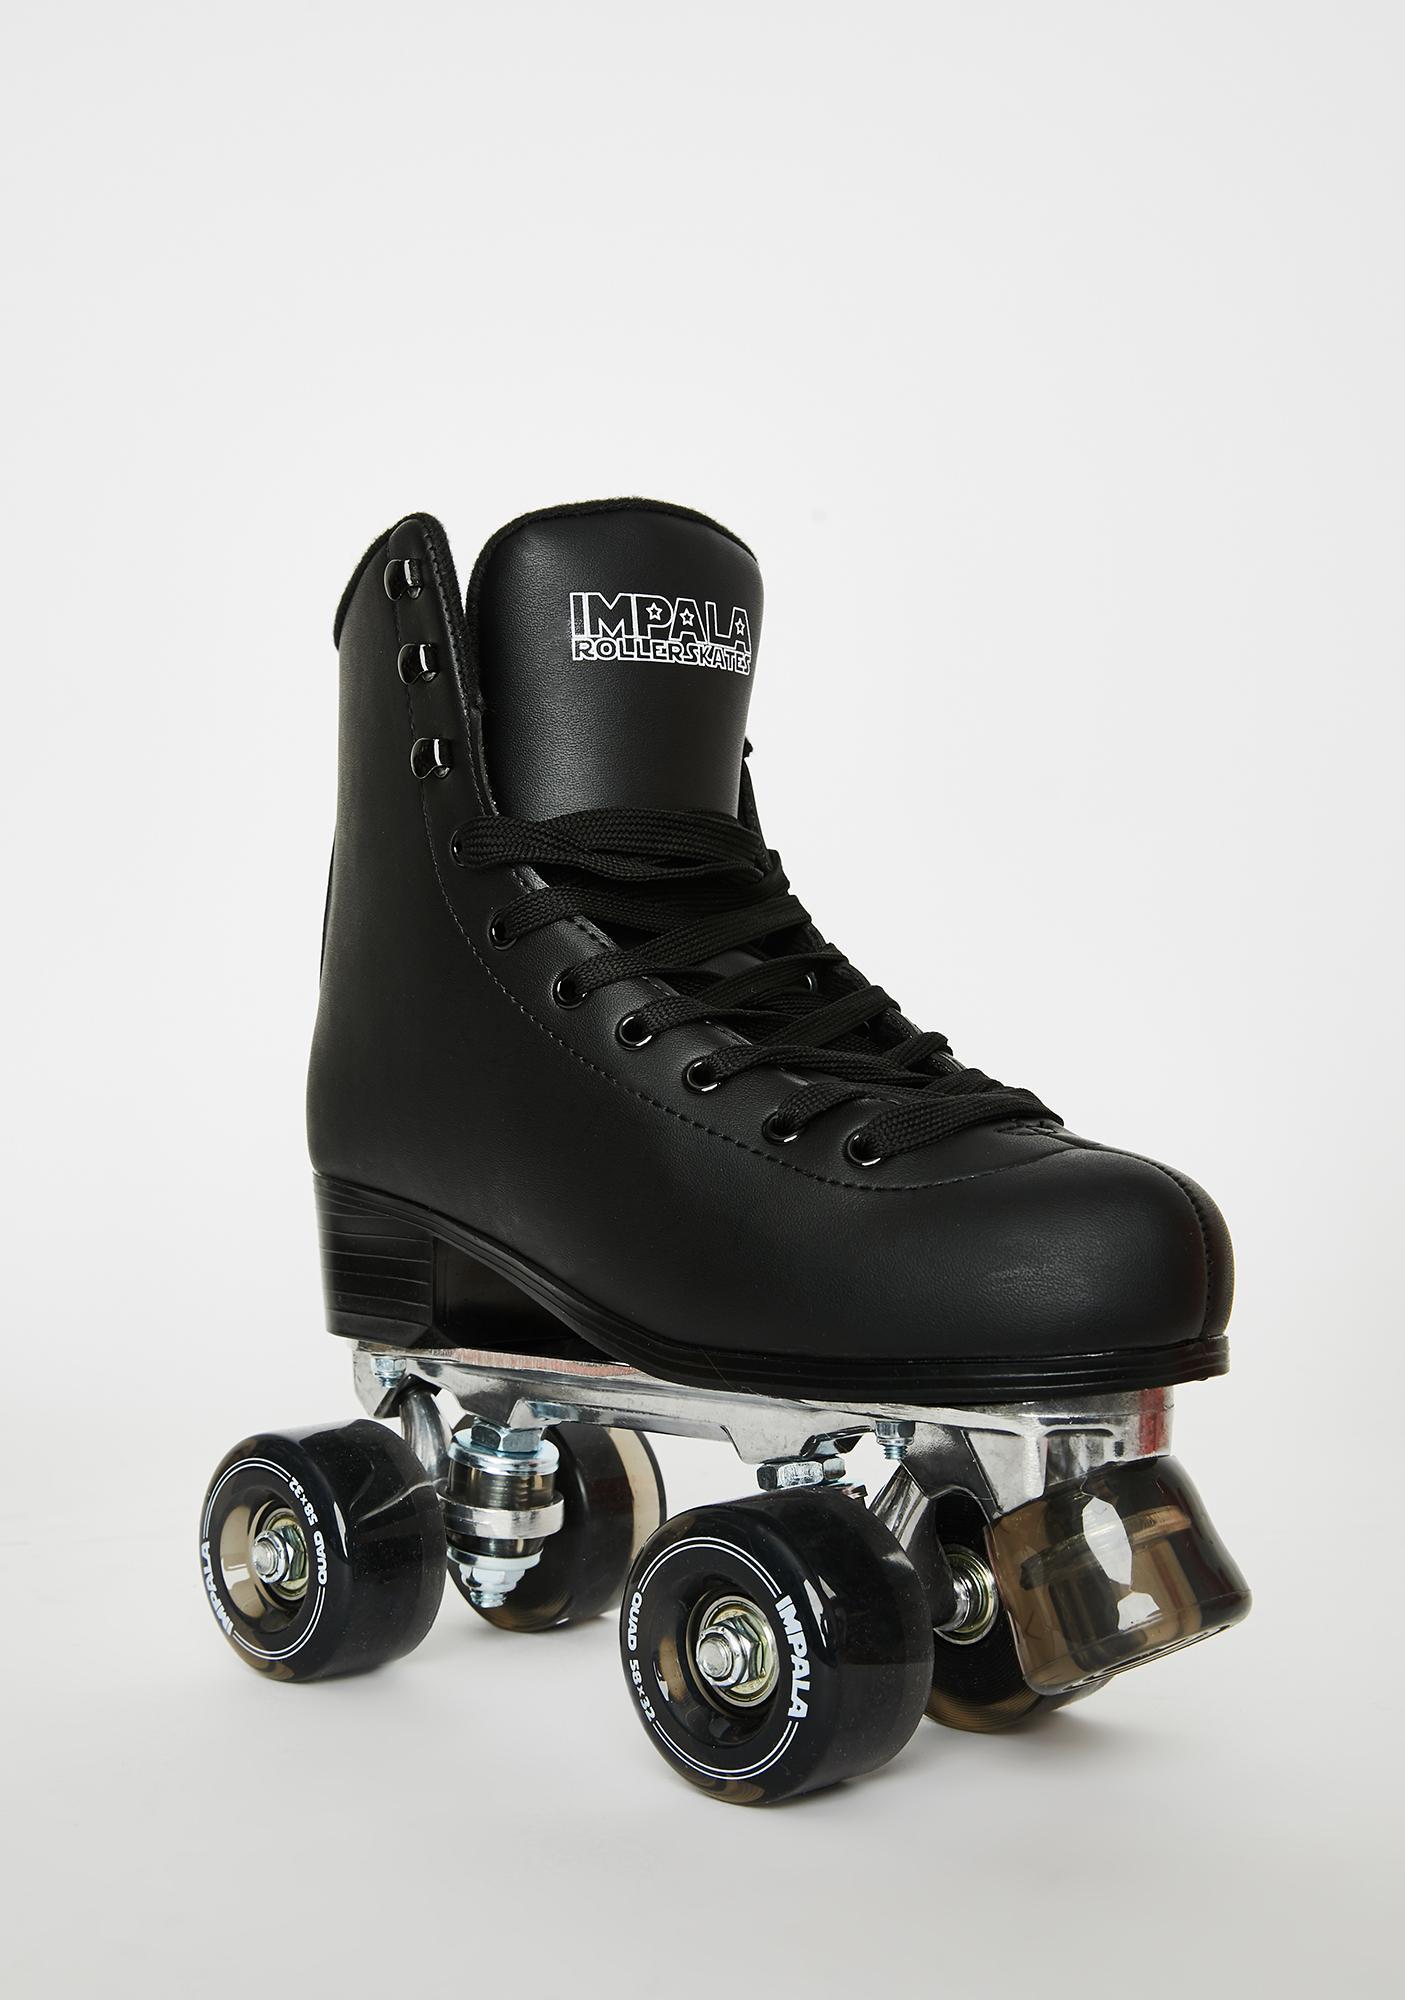 Impala Rollerskates Black Impala Quad Skates